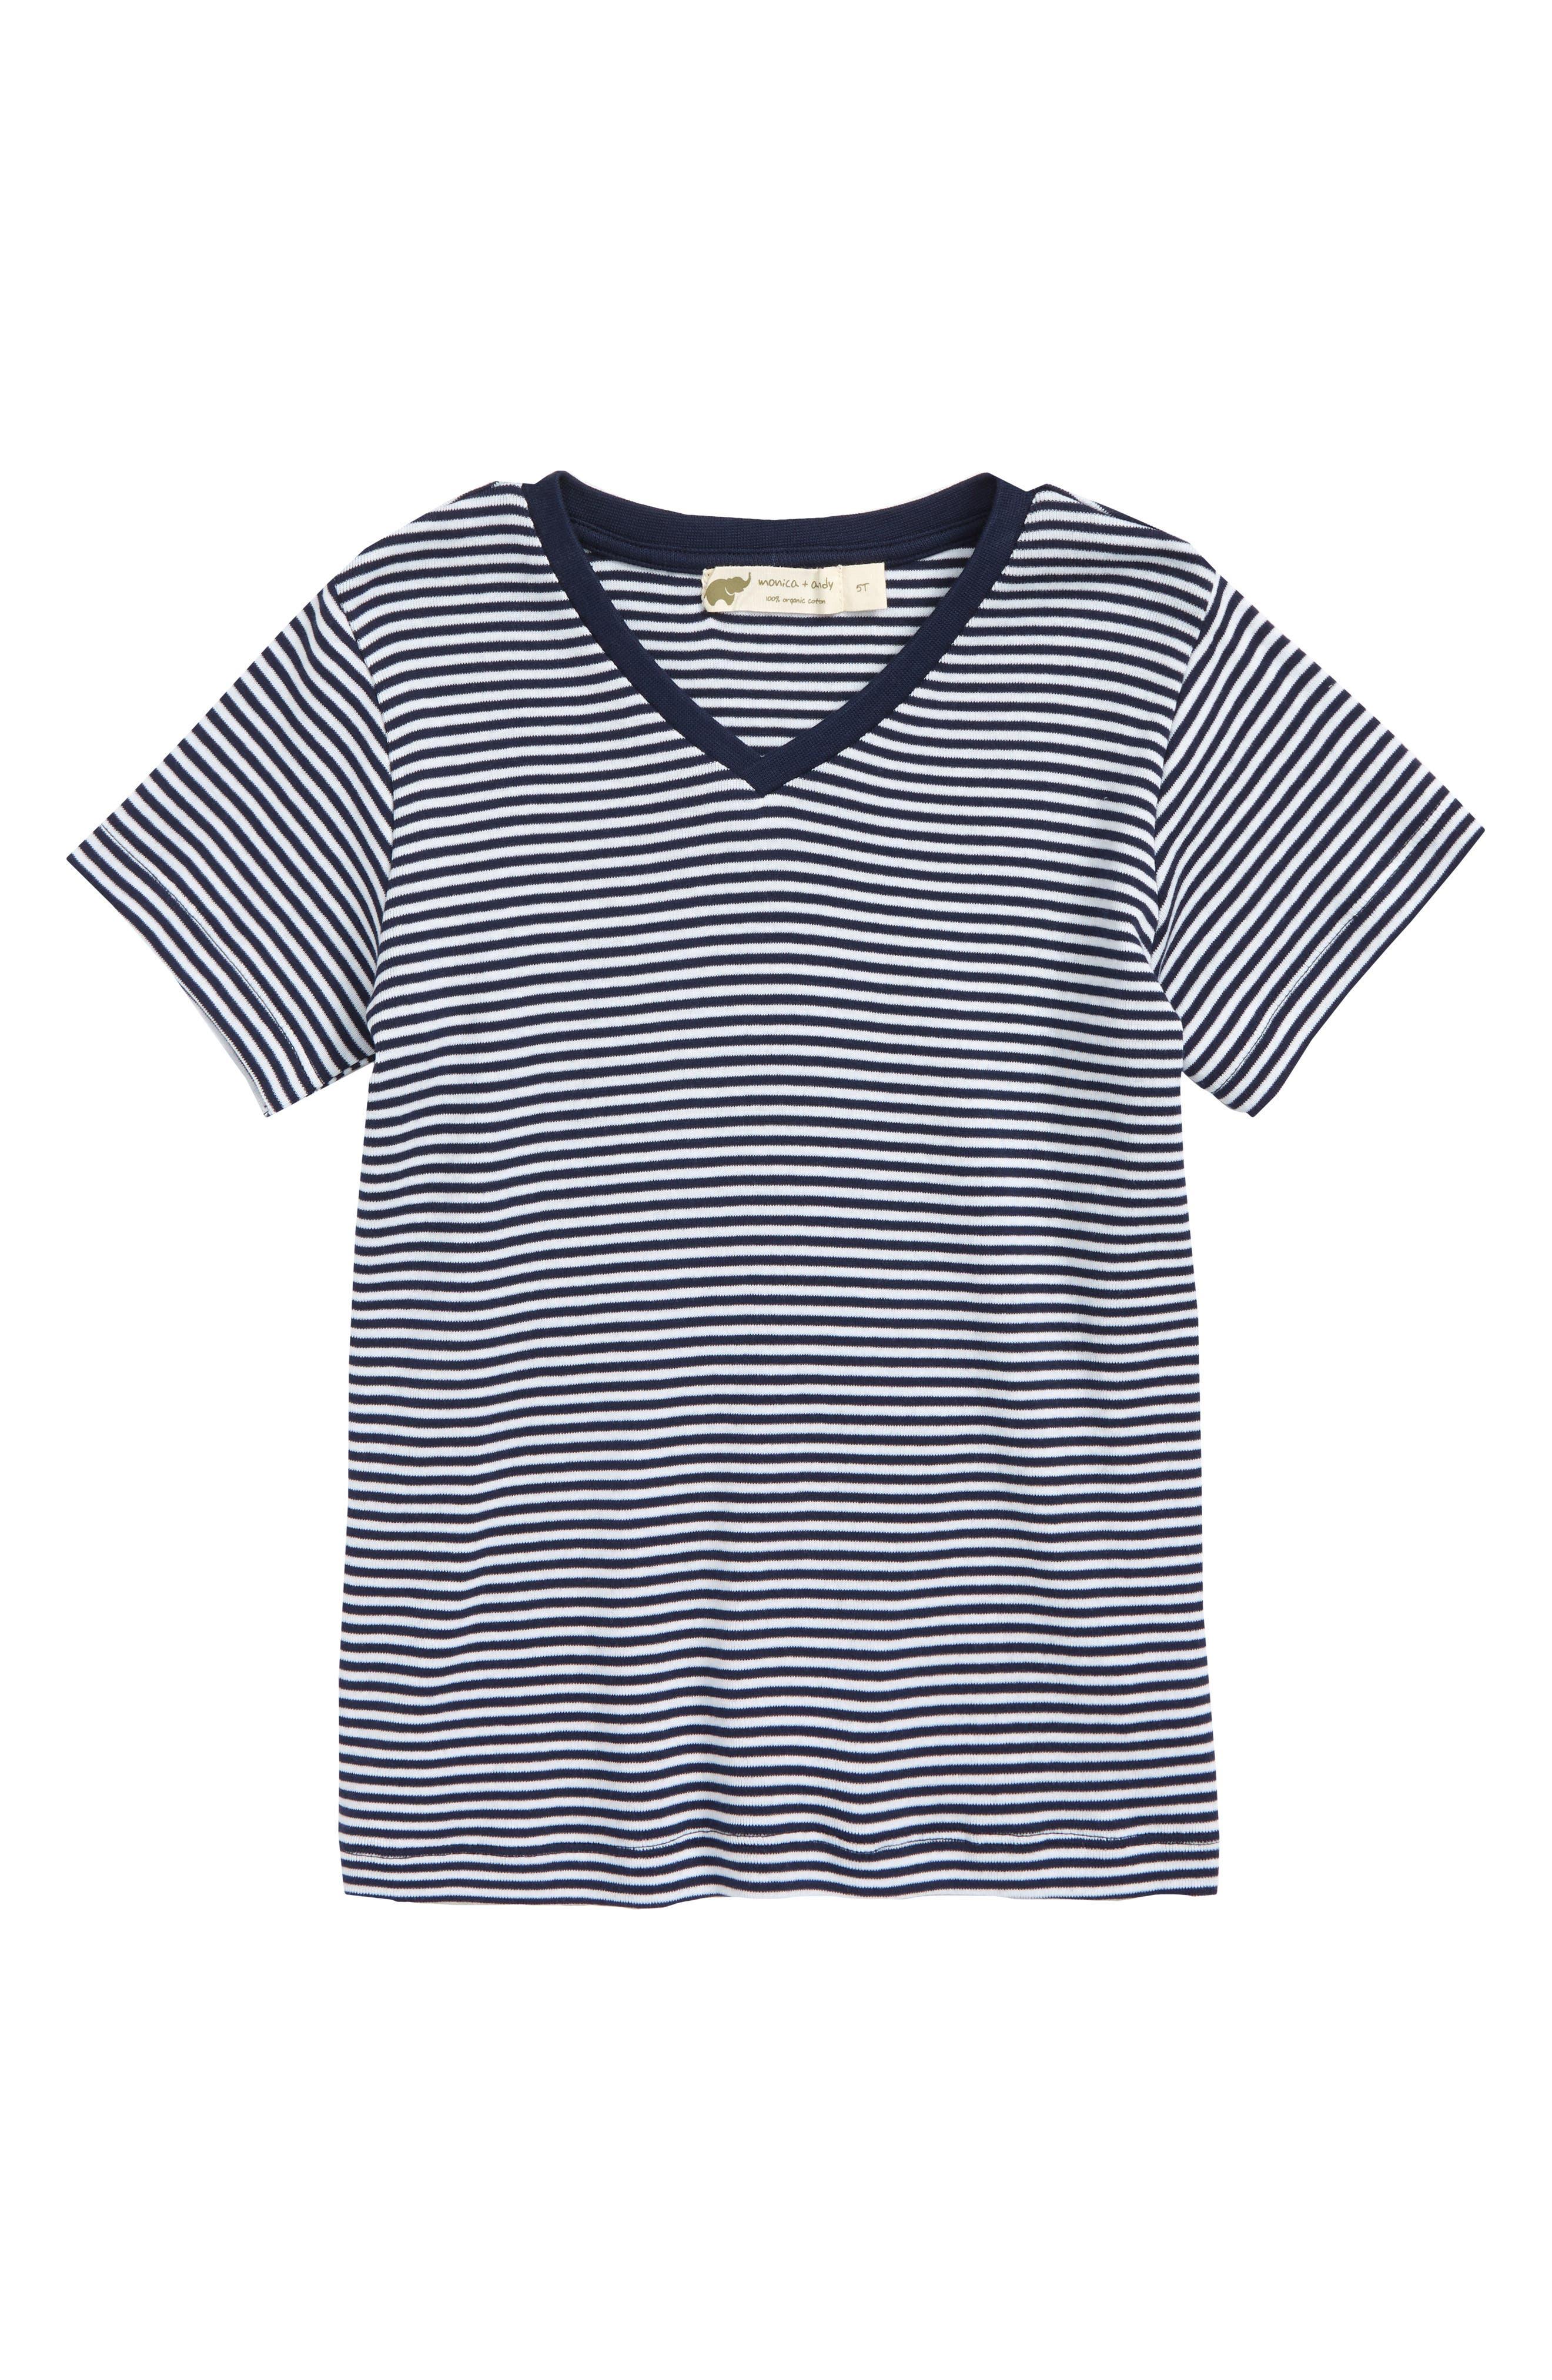 Stripe Organic Cotton T-Shirt,                         Main,                         color, Navy/ White Stripe